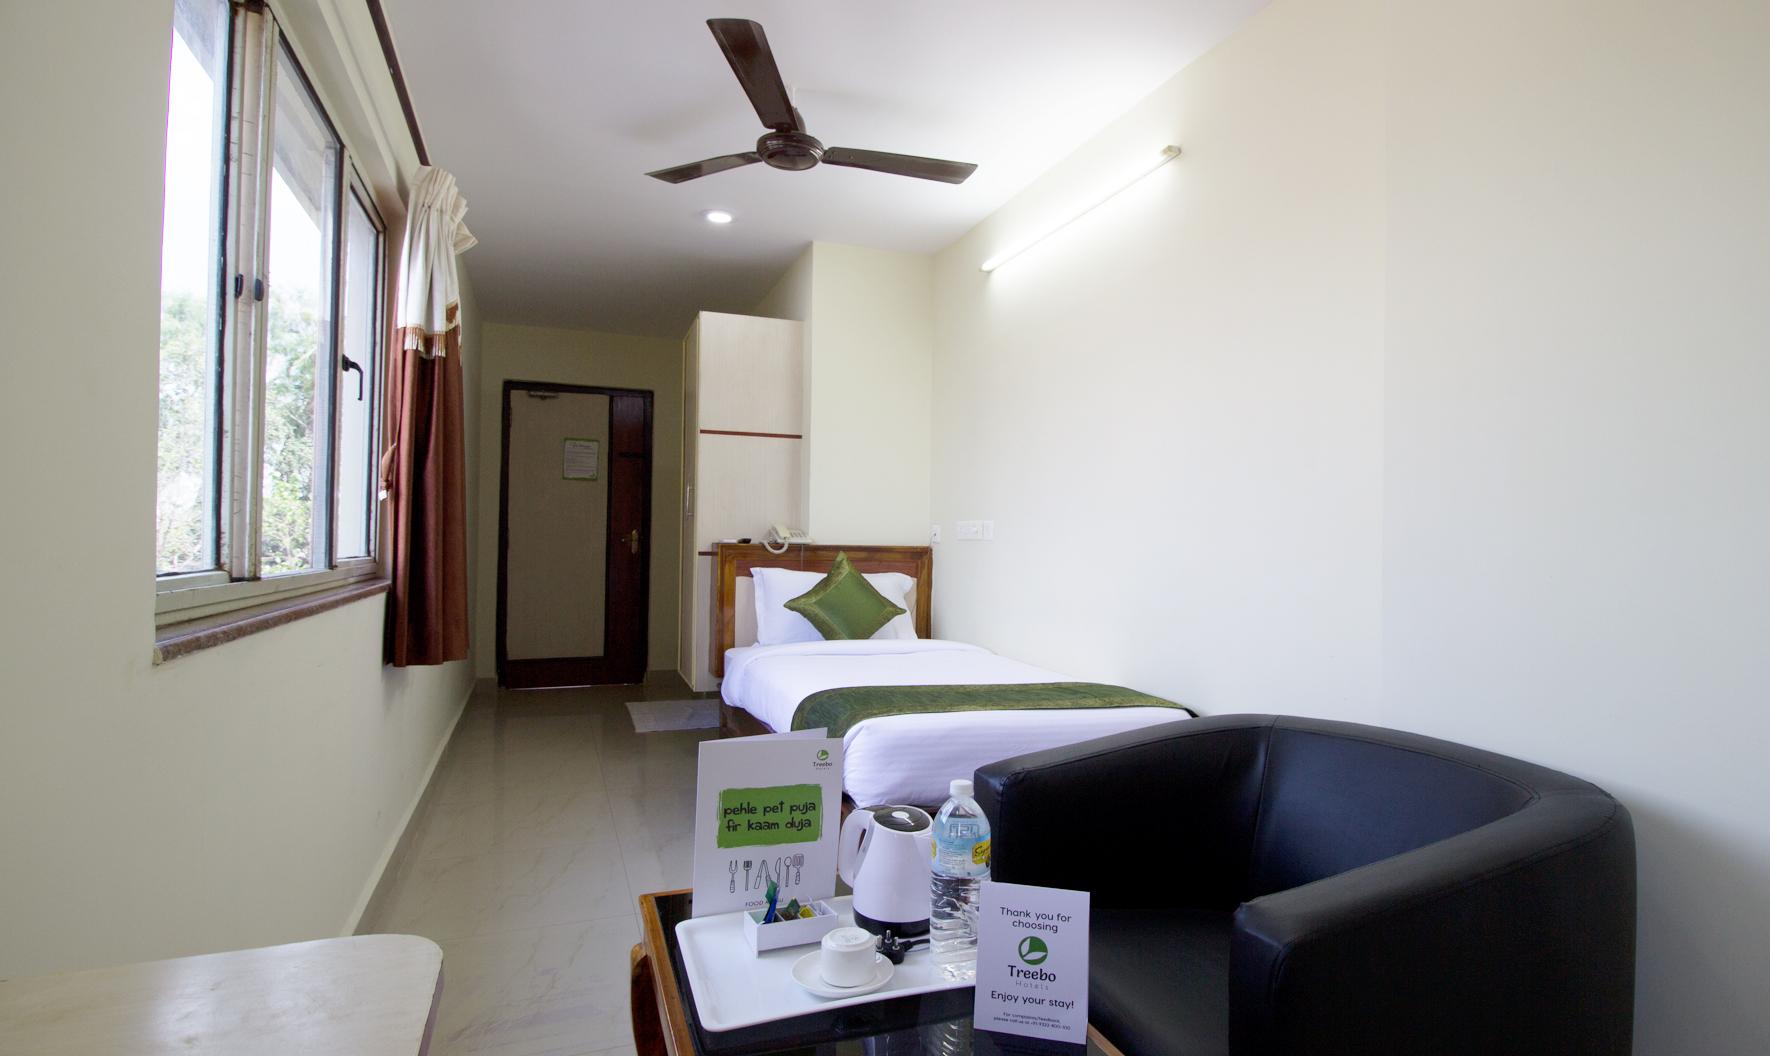 Hotels in Vijayawada | Book the Best Hotels in Vijayawada - Tariff ₹799